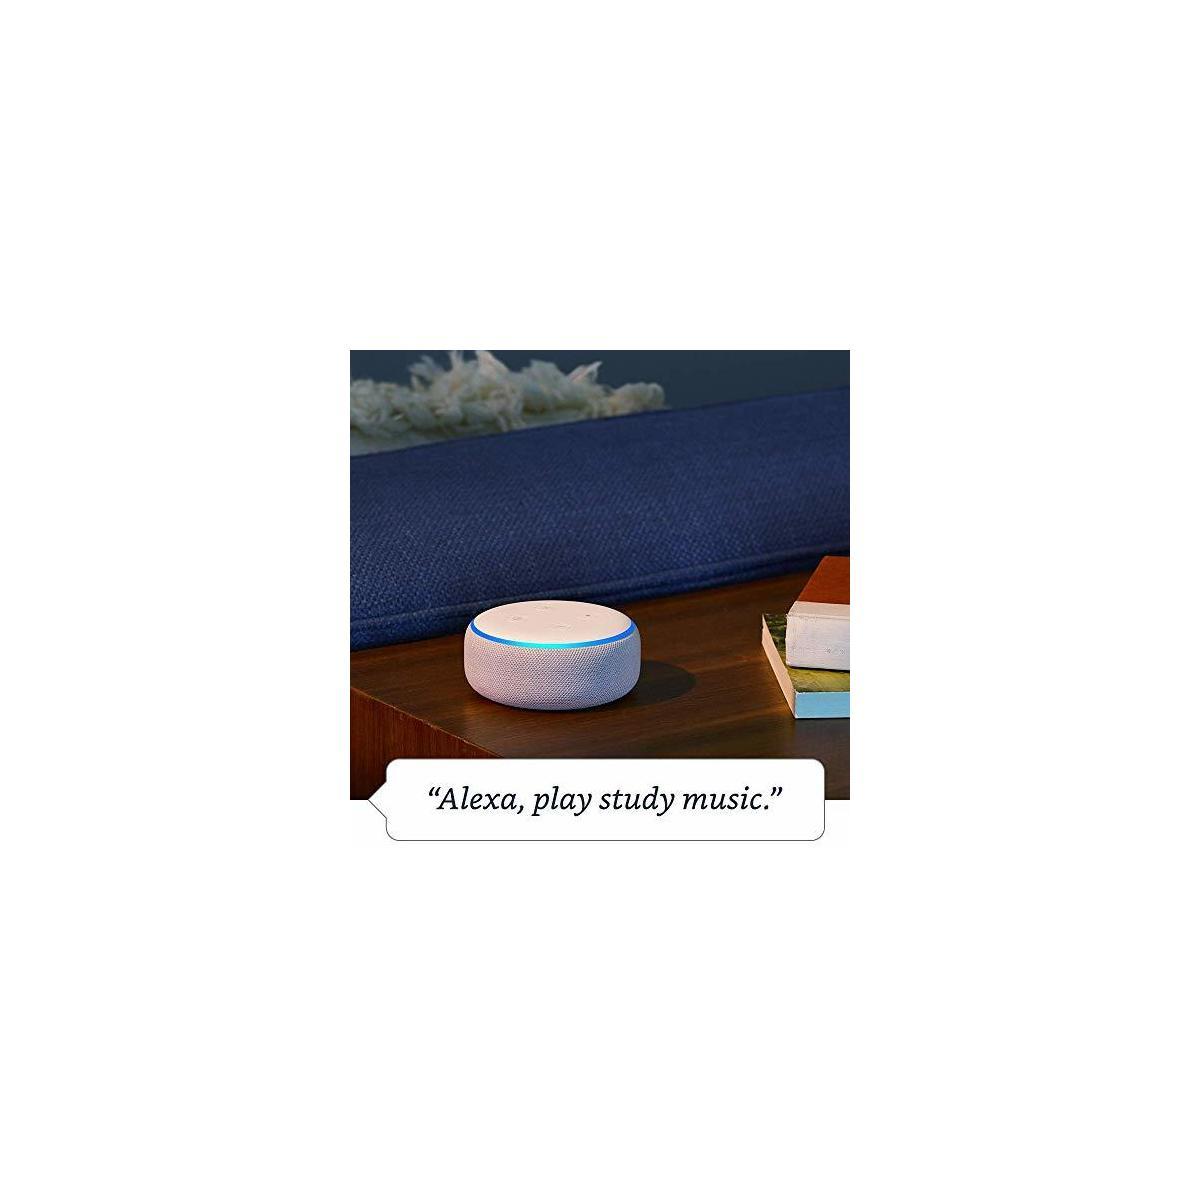 Echo Dot (3rd Gen) - Smart speaker with Alexa - ONLY COLORS: Charcoal, Heather Gray, Plum, Sandstone